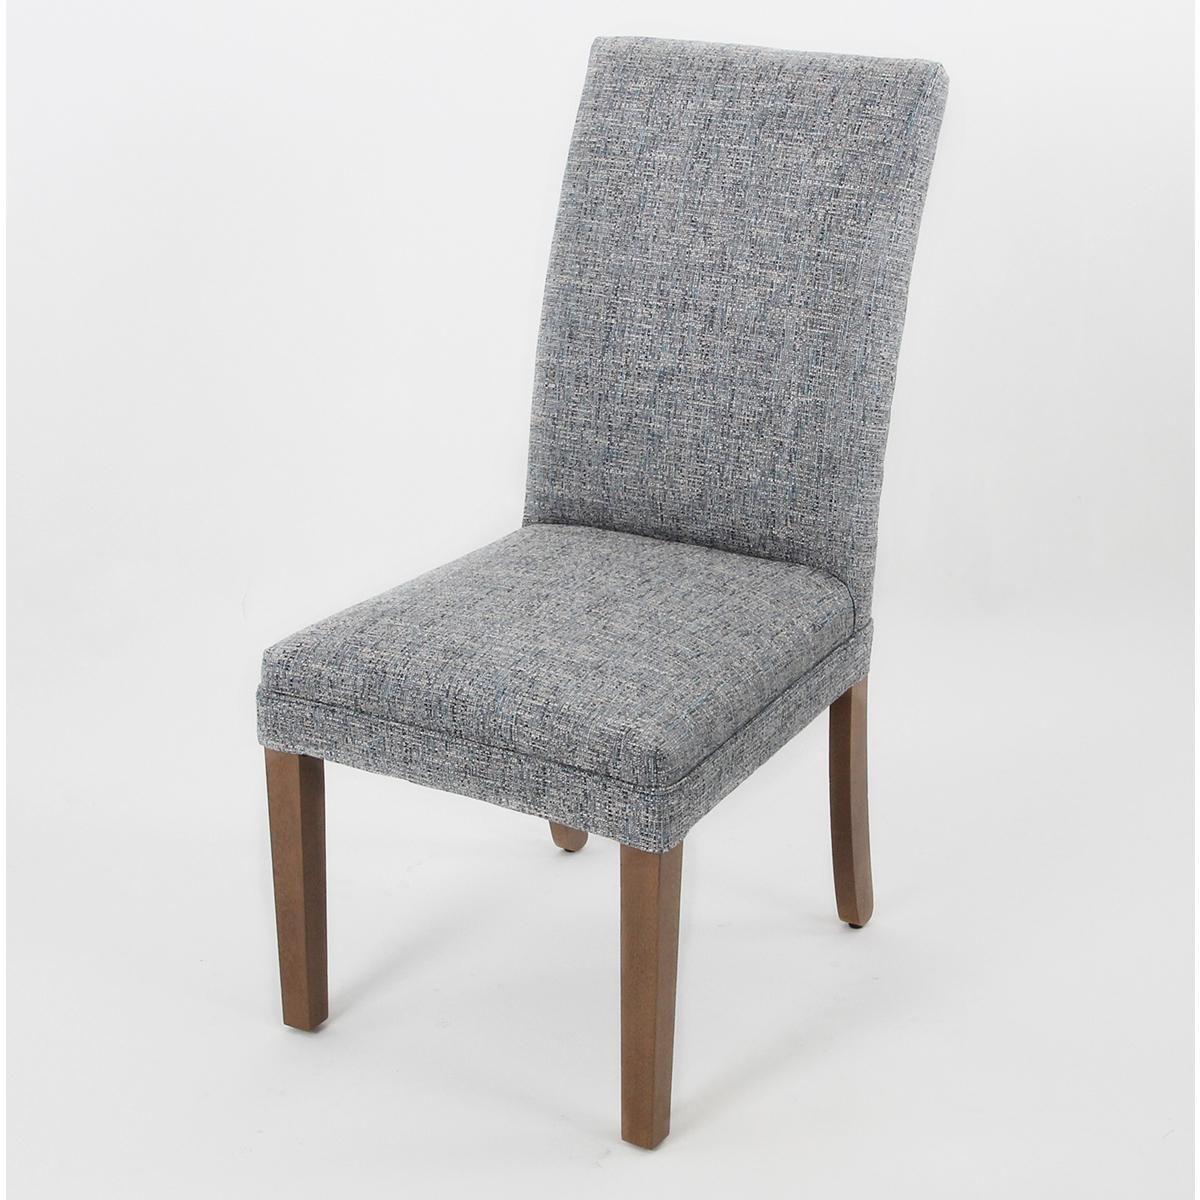 Nfm 41 Nebraska Furniture Mart Furniture Mart Parsons Chairs